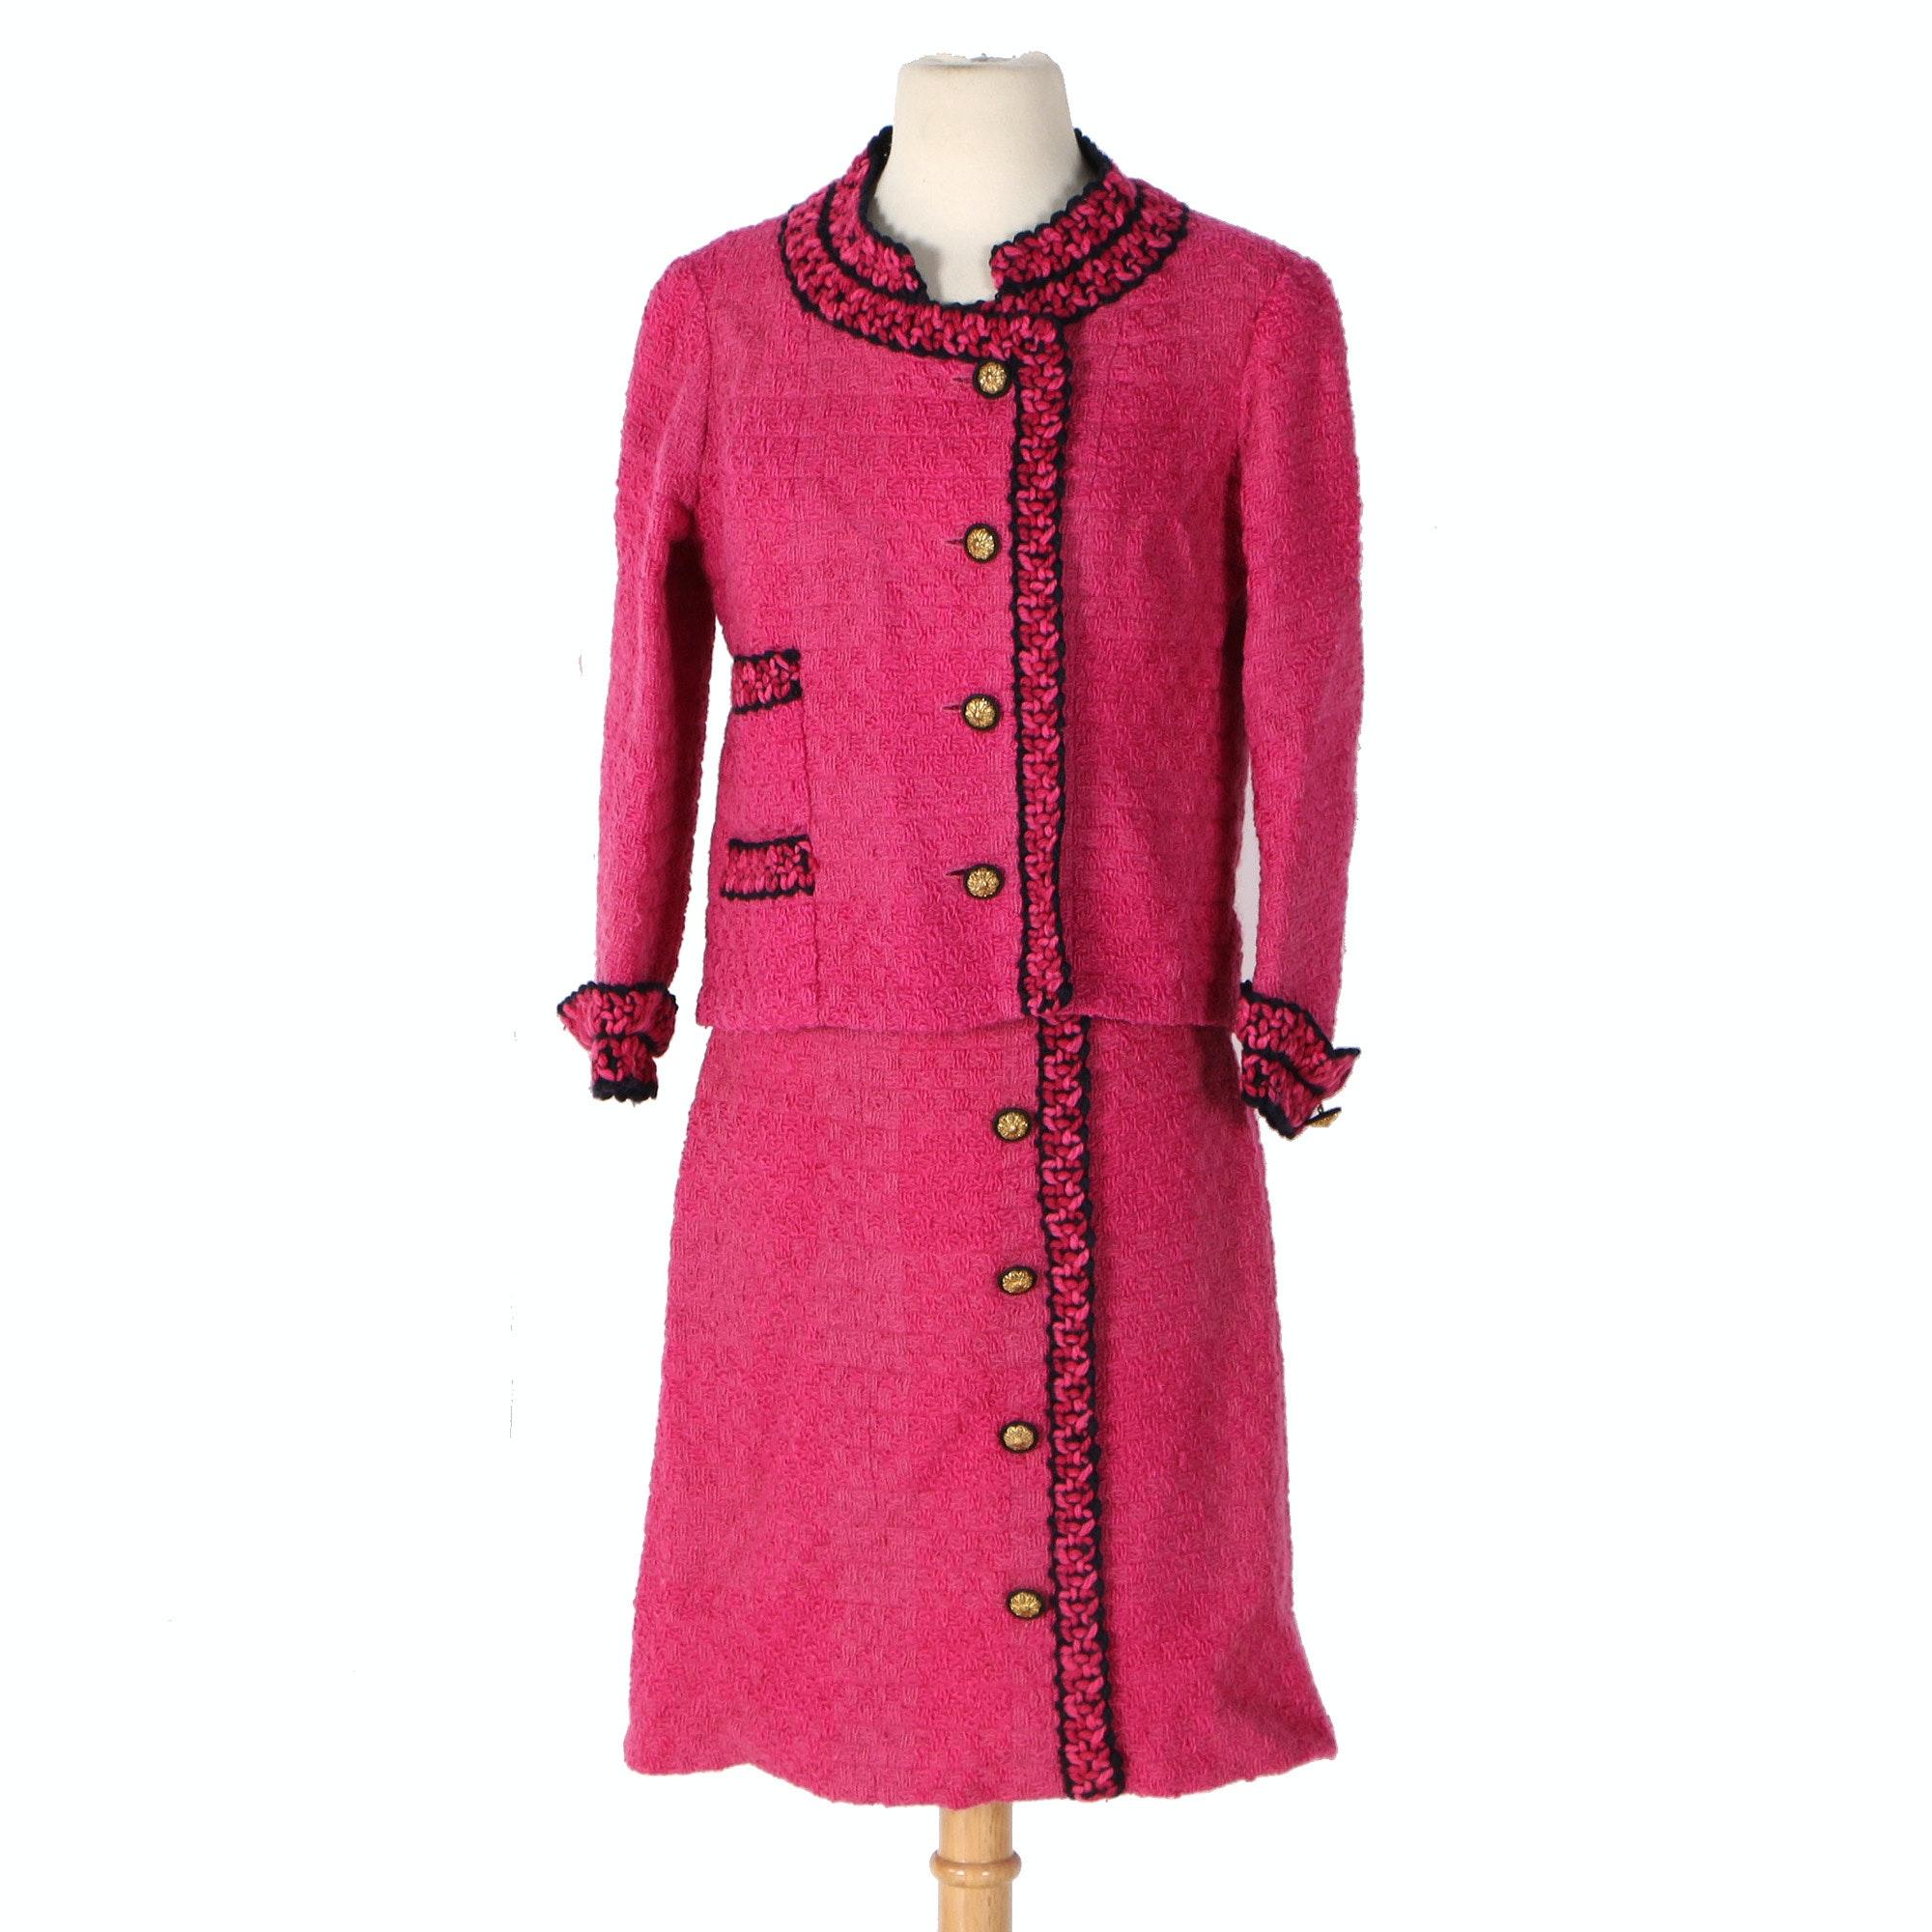 Vintage Chanel Pink Knit Skirt Suit